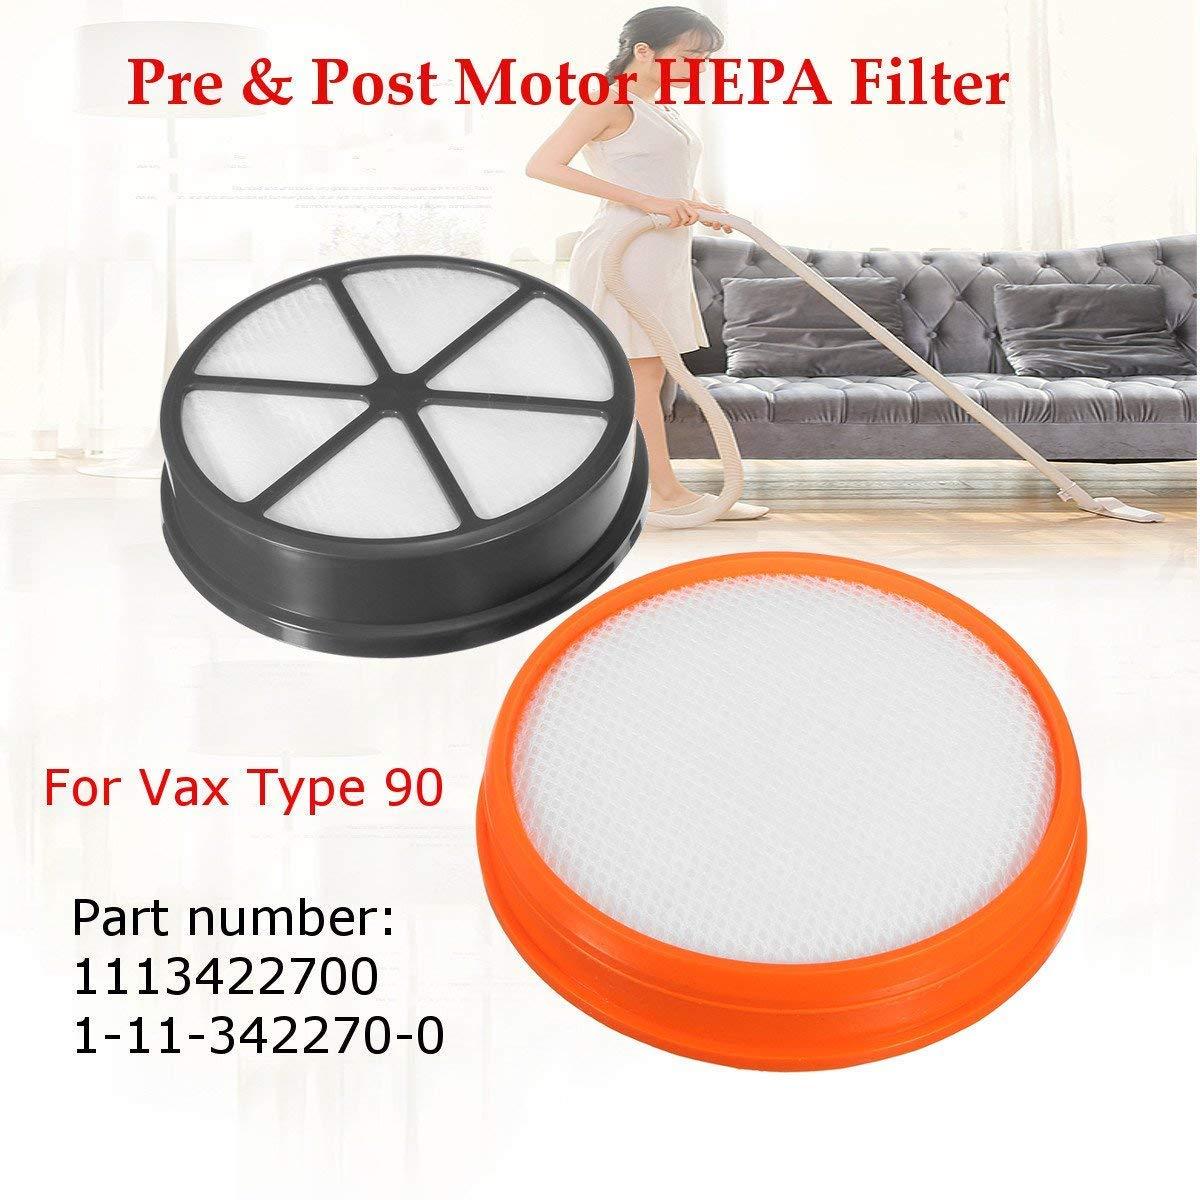 Pre Amp Post Motor Type 90 Hepa Filter Kit For Vax Air